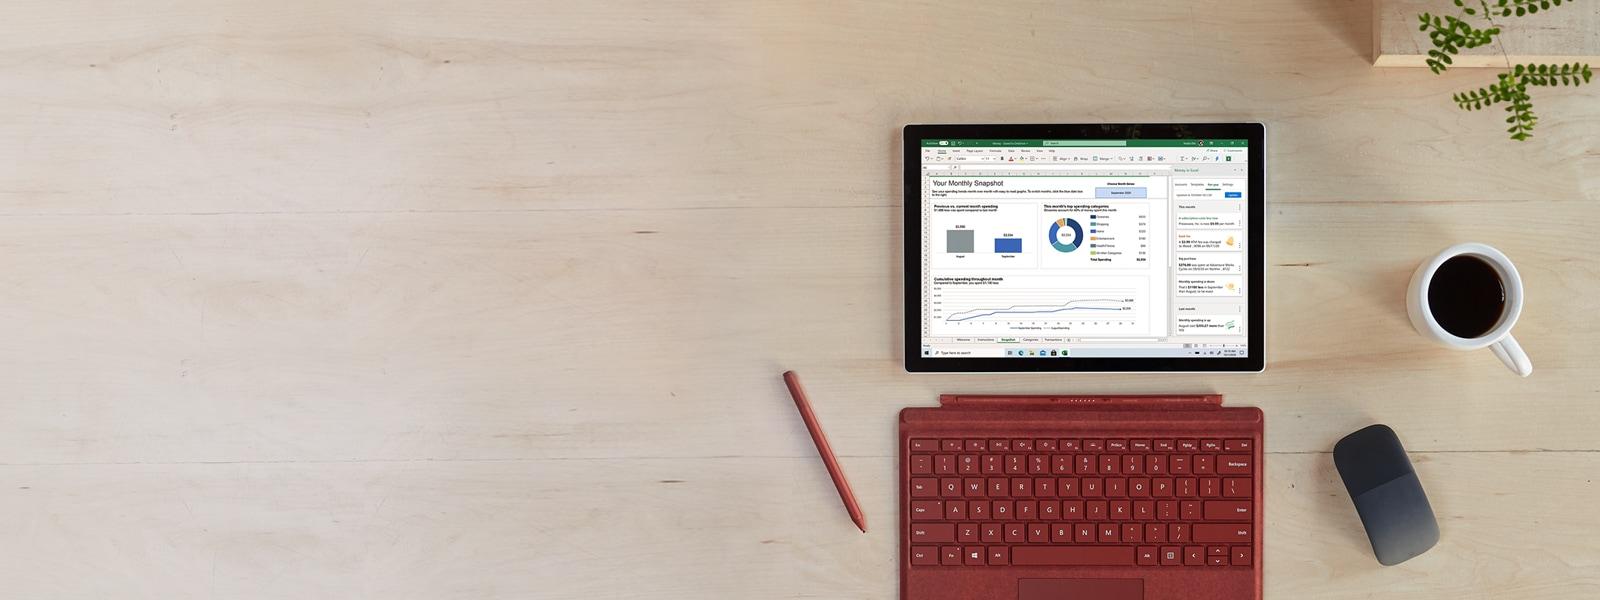 Surface Pro 7 i akcesoria na biurku